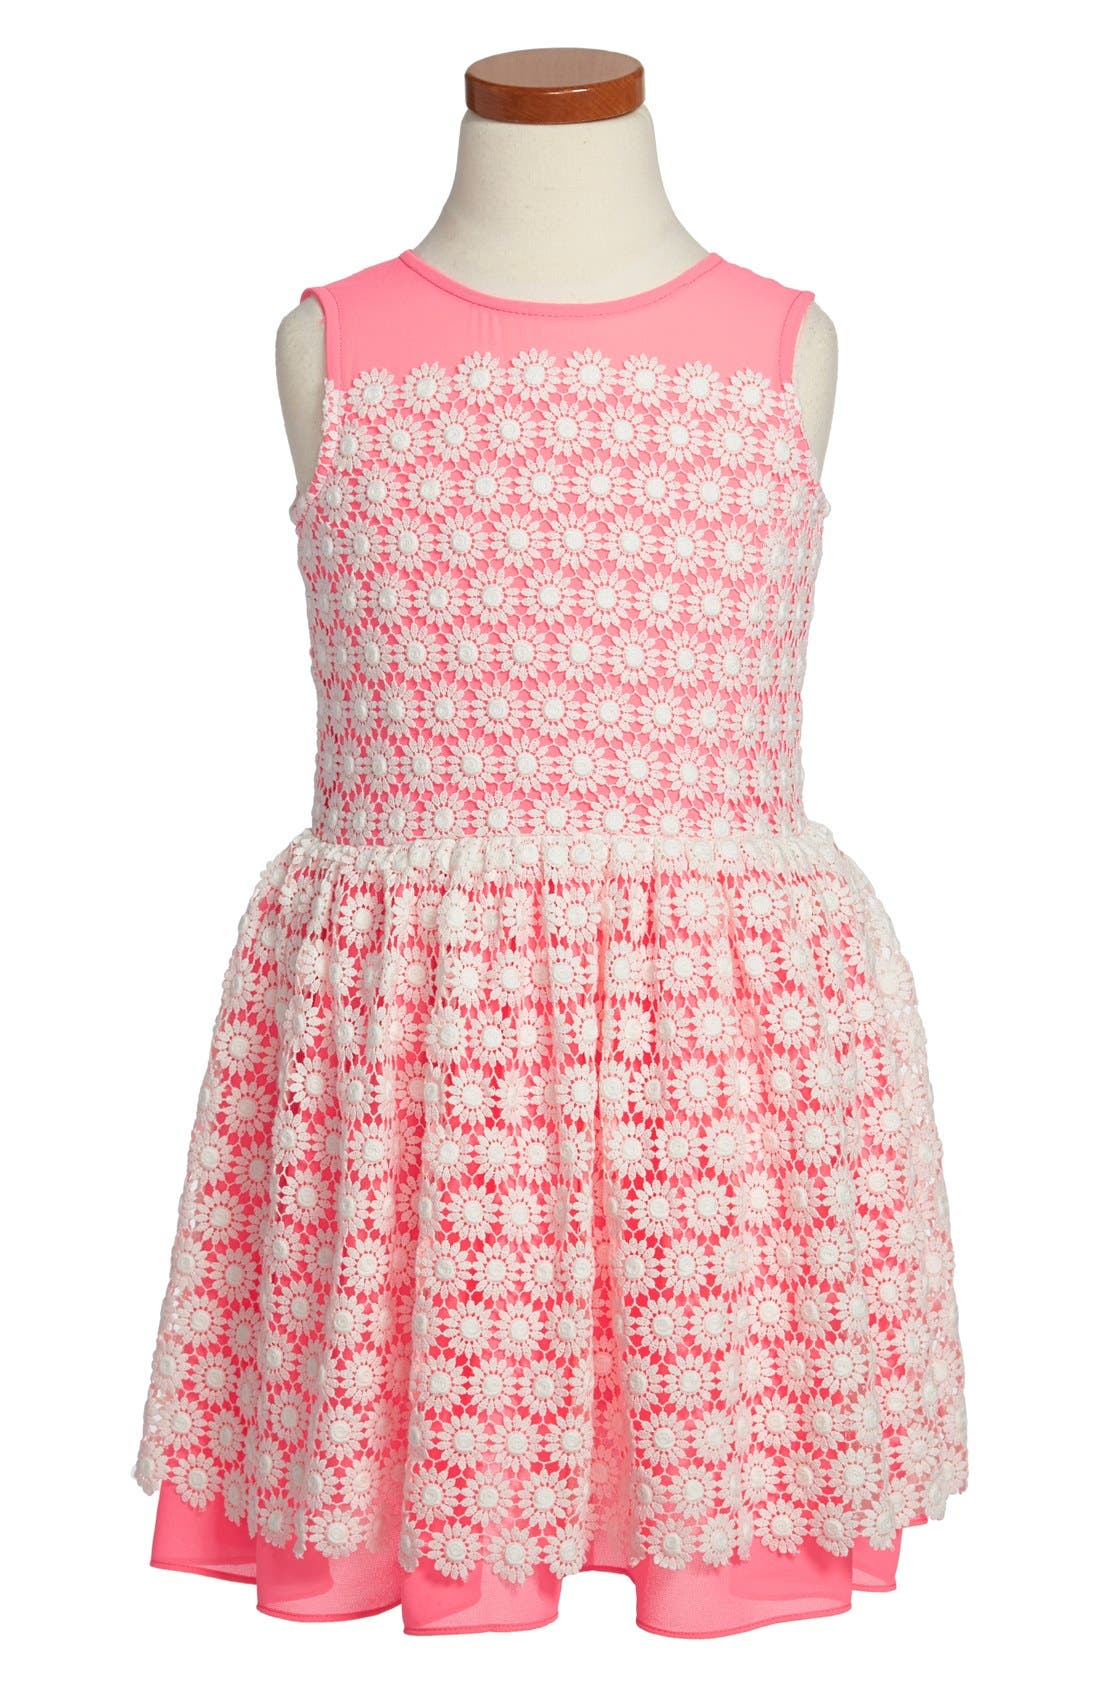 Main Image - Halabaloo Crochet Lace Party Dress (Toddler Girls & Little Girls)